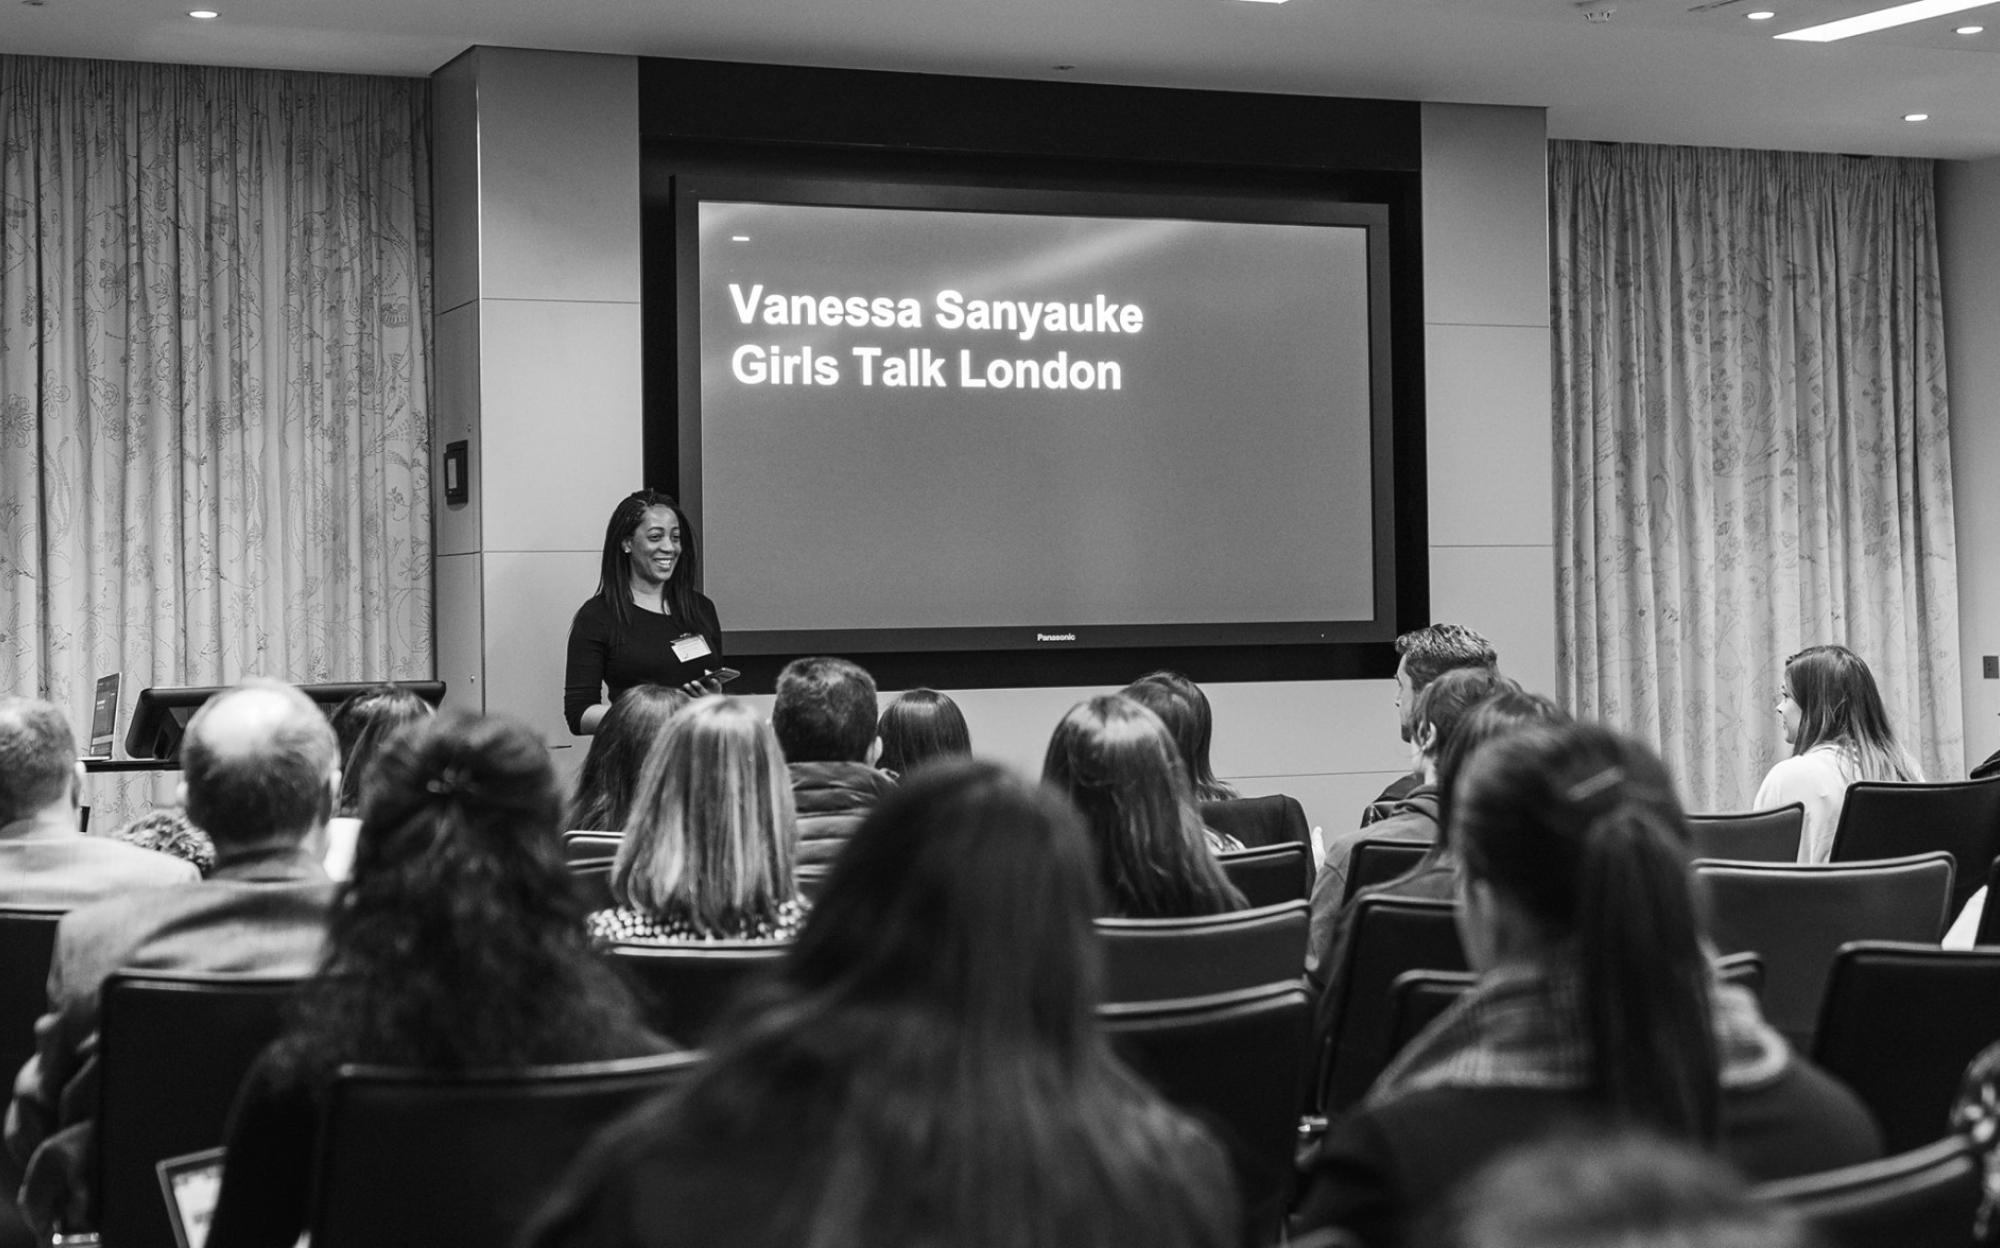 Vanessa Sanyauke at a Girls Talk London event